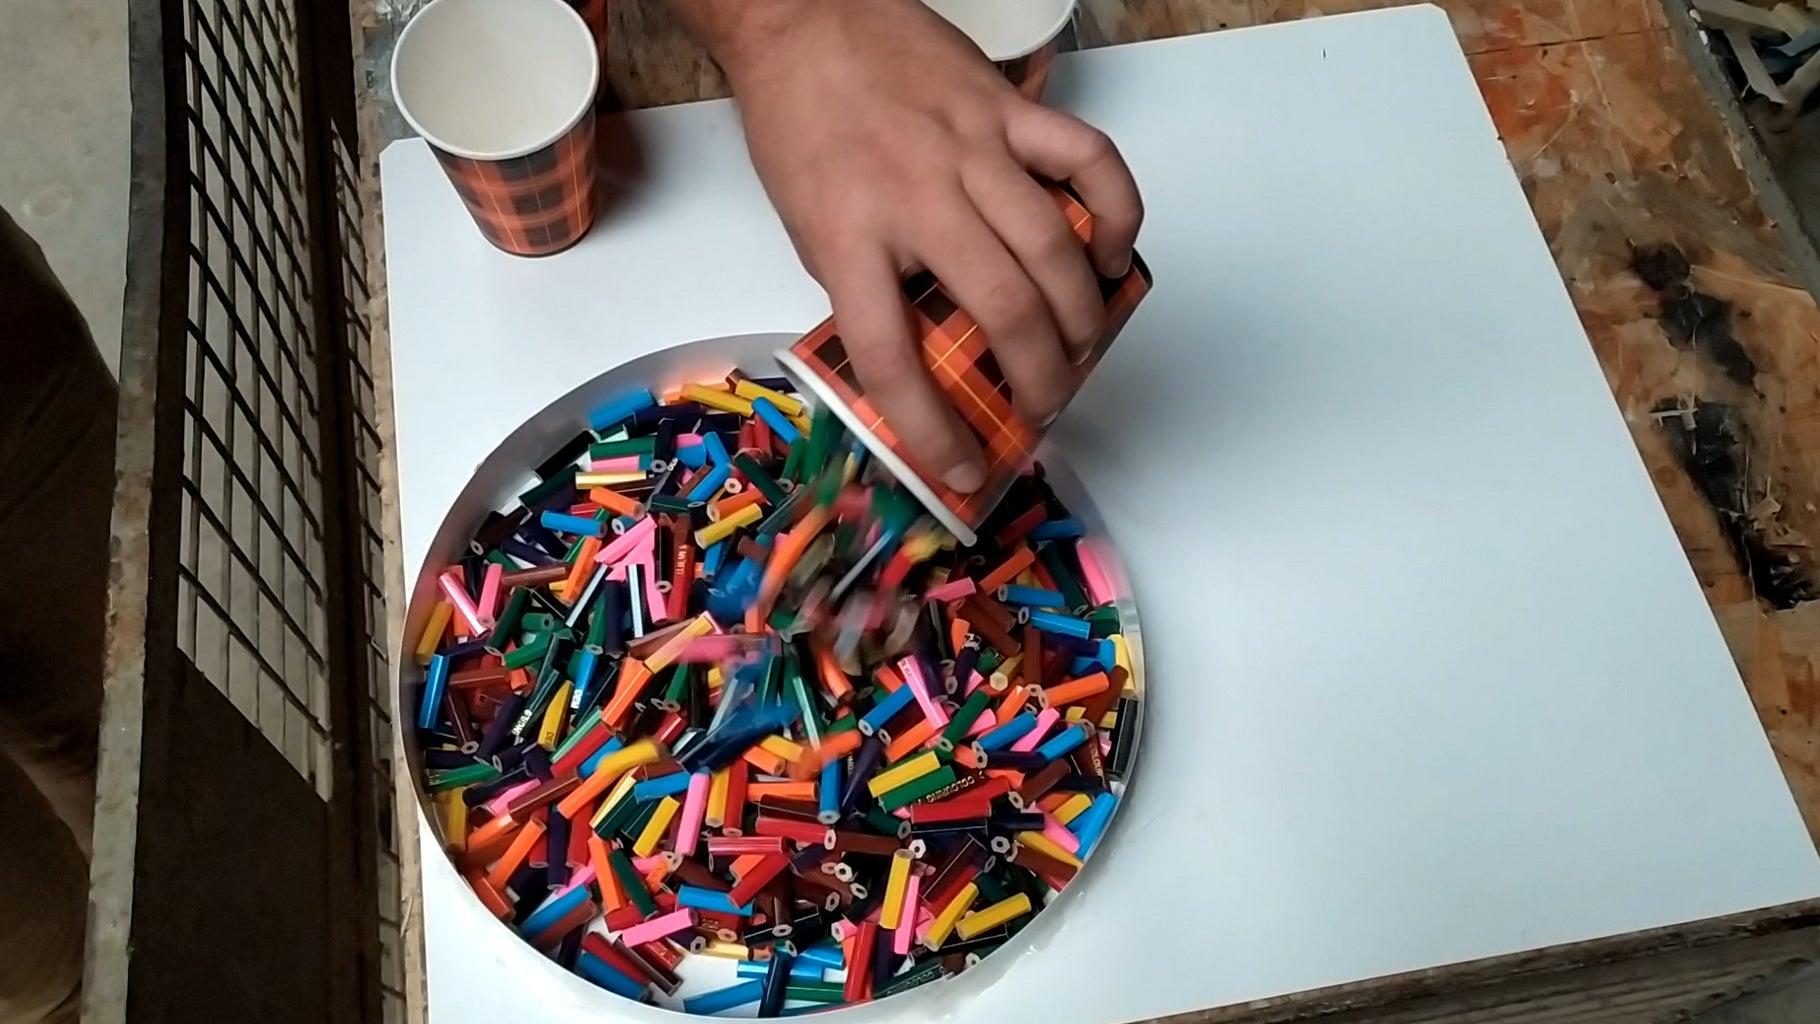 Cutting Crayons